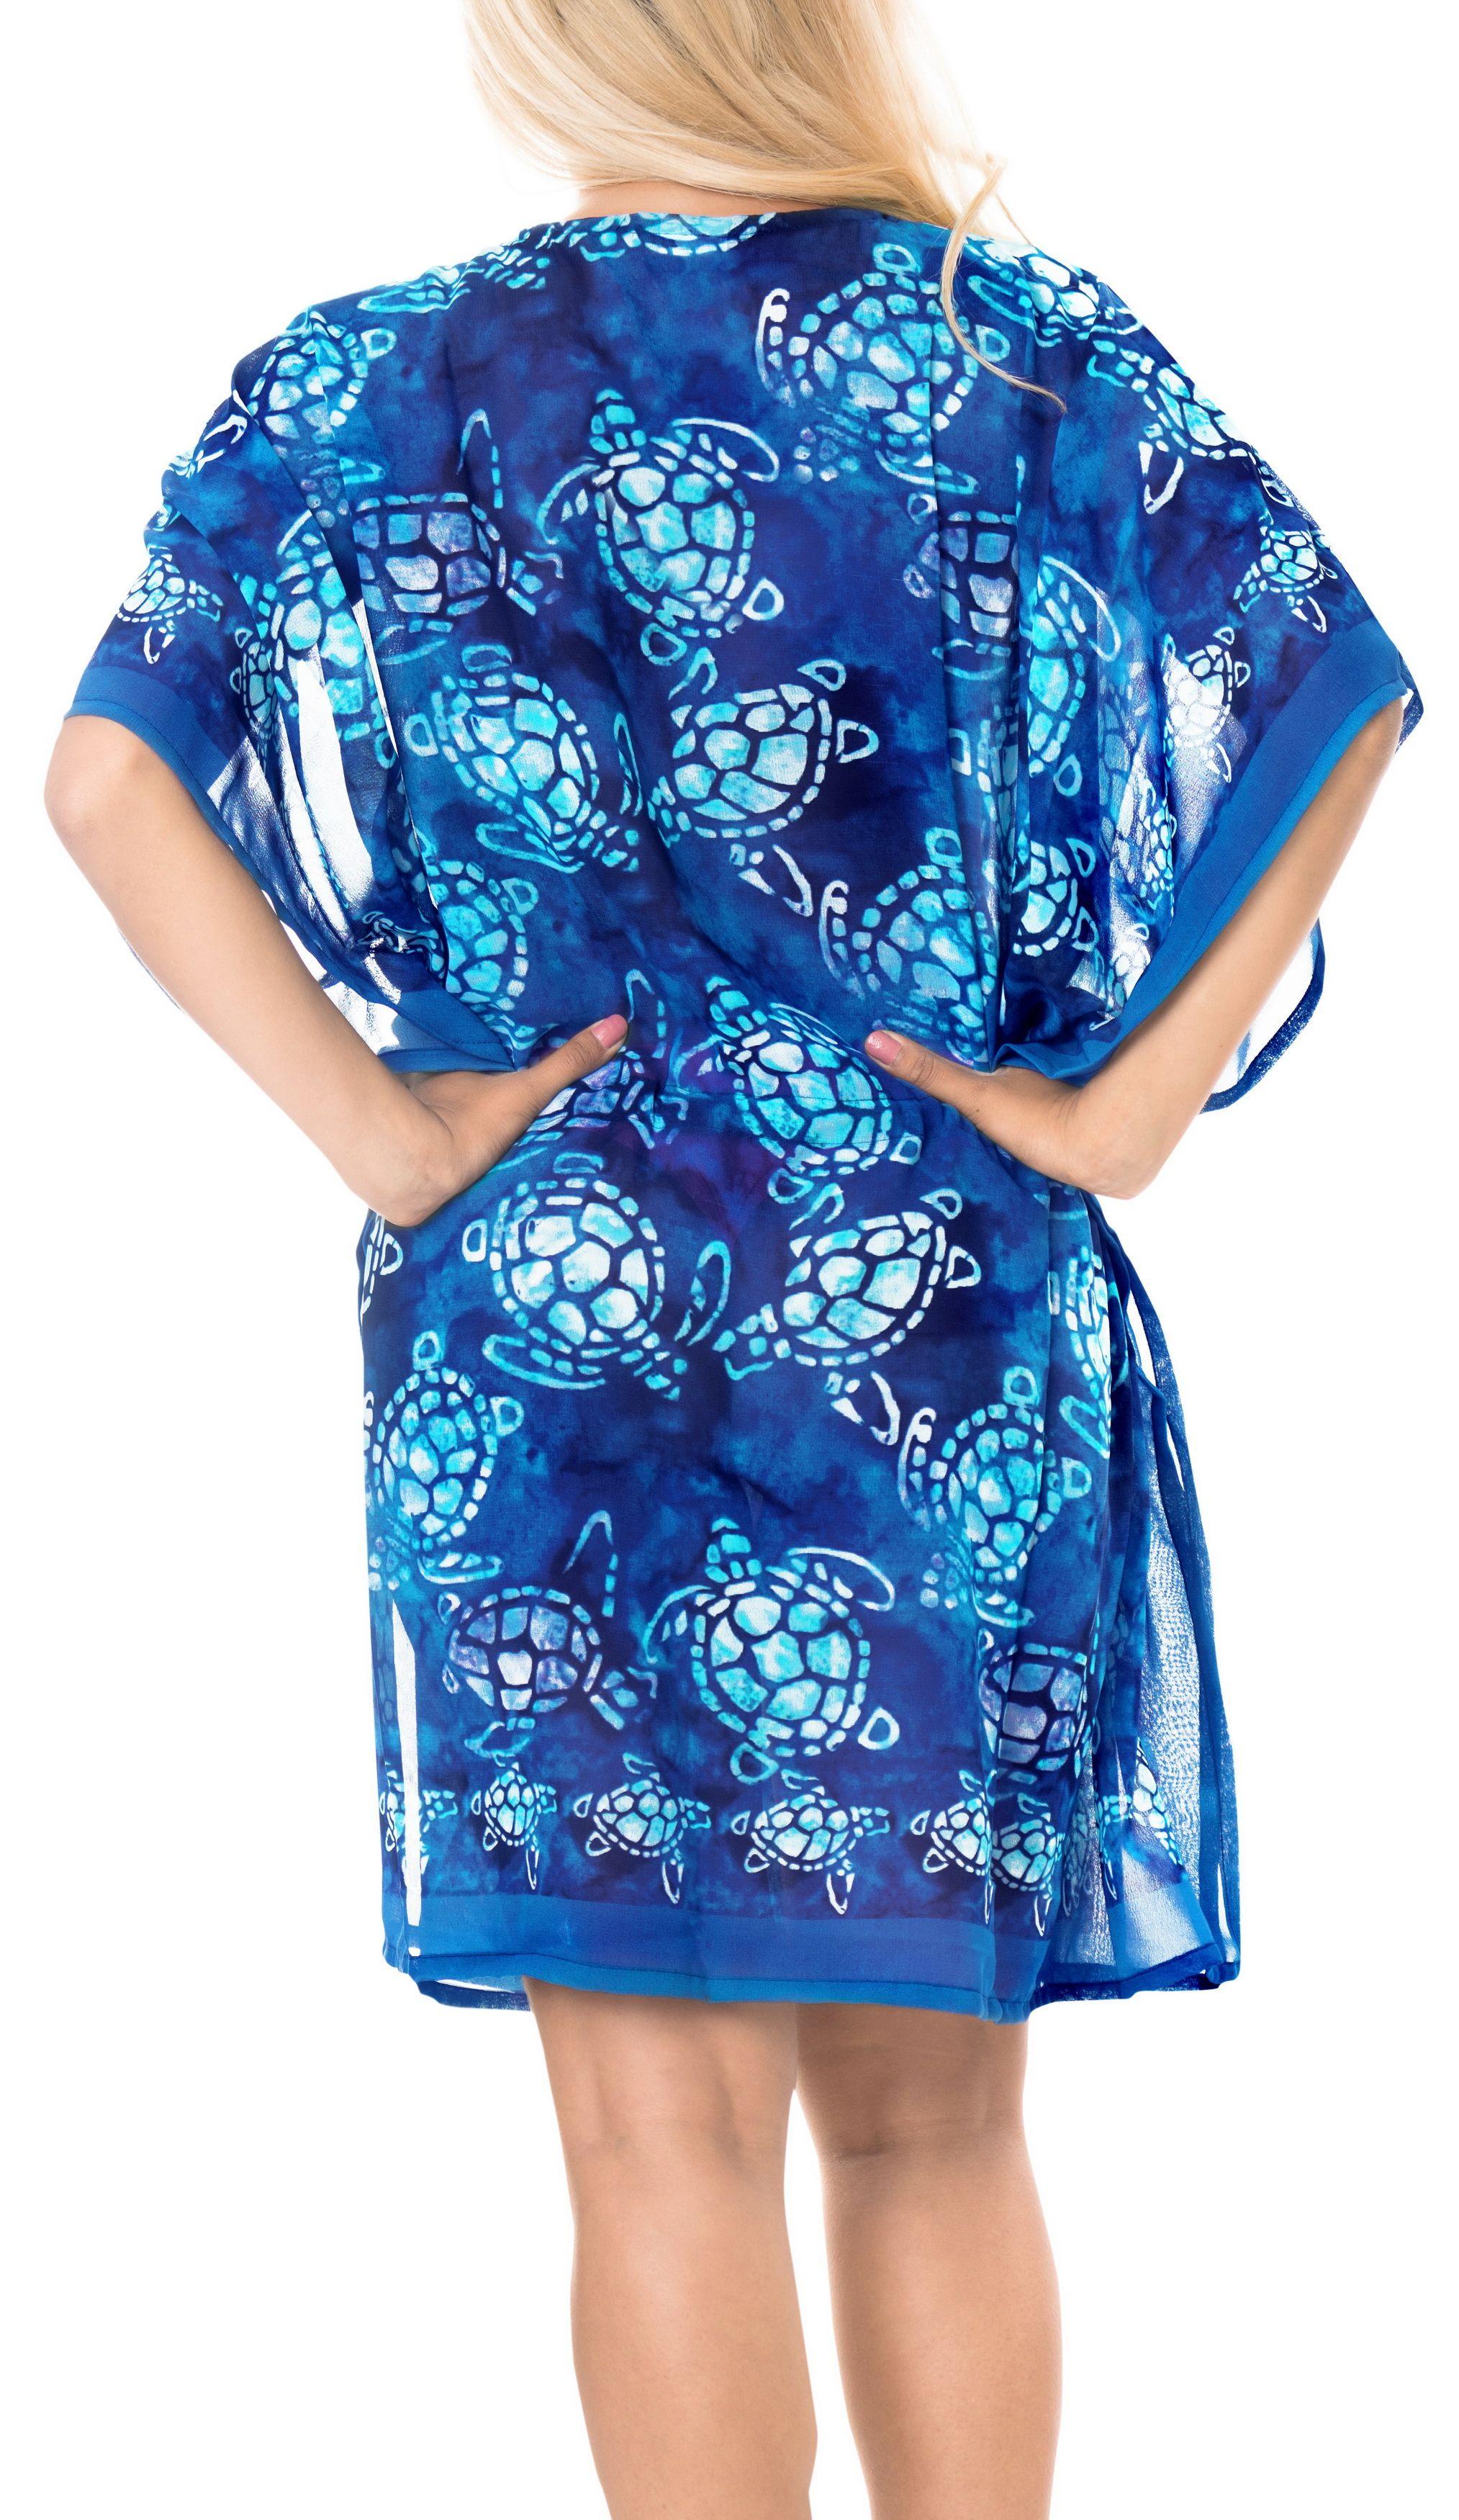 e96c54cb0e2 Swimsuit Swimwear Cover ups Bathing Suit For WOMEN Hawaii Miami Resortwear  Dress#ups, #Bathing, #Cover